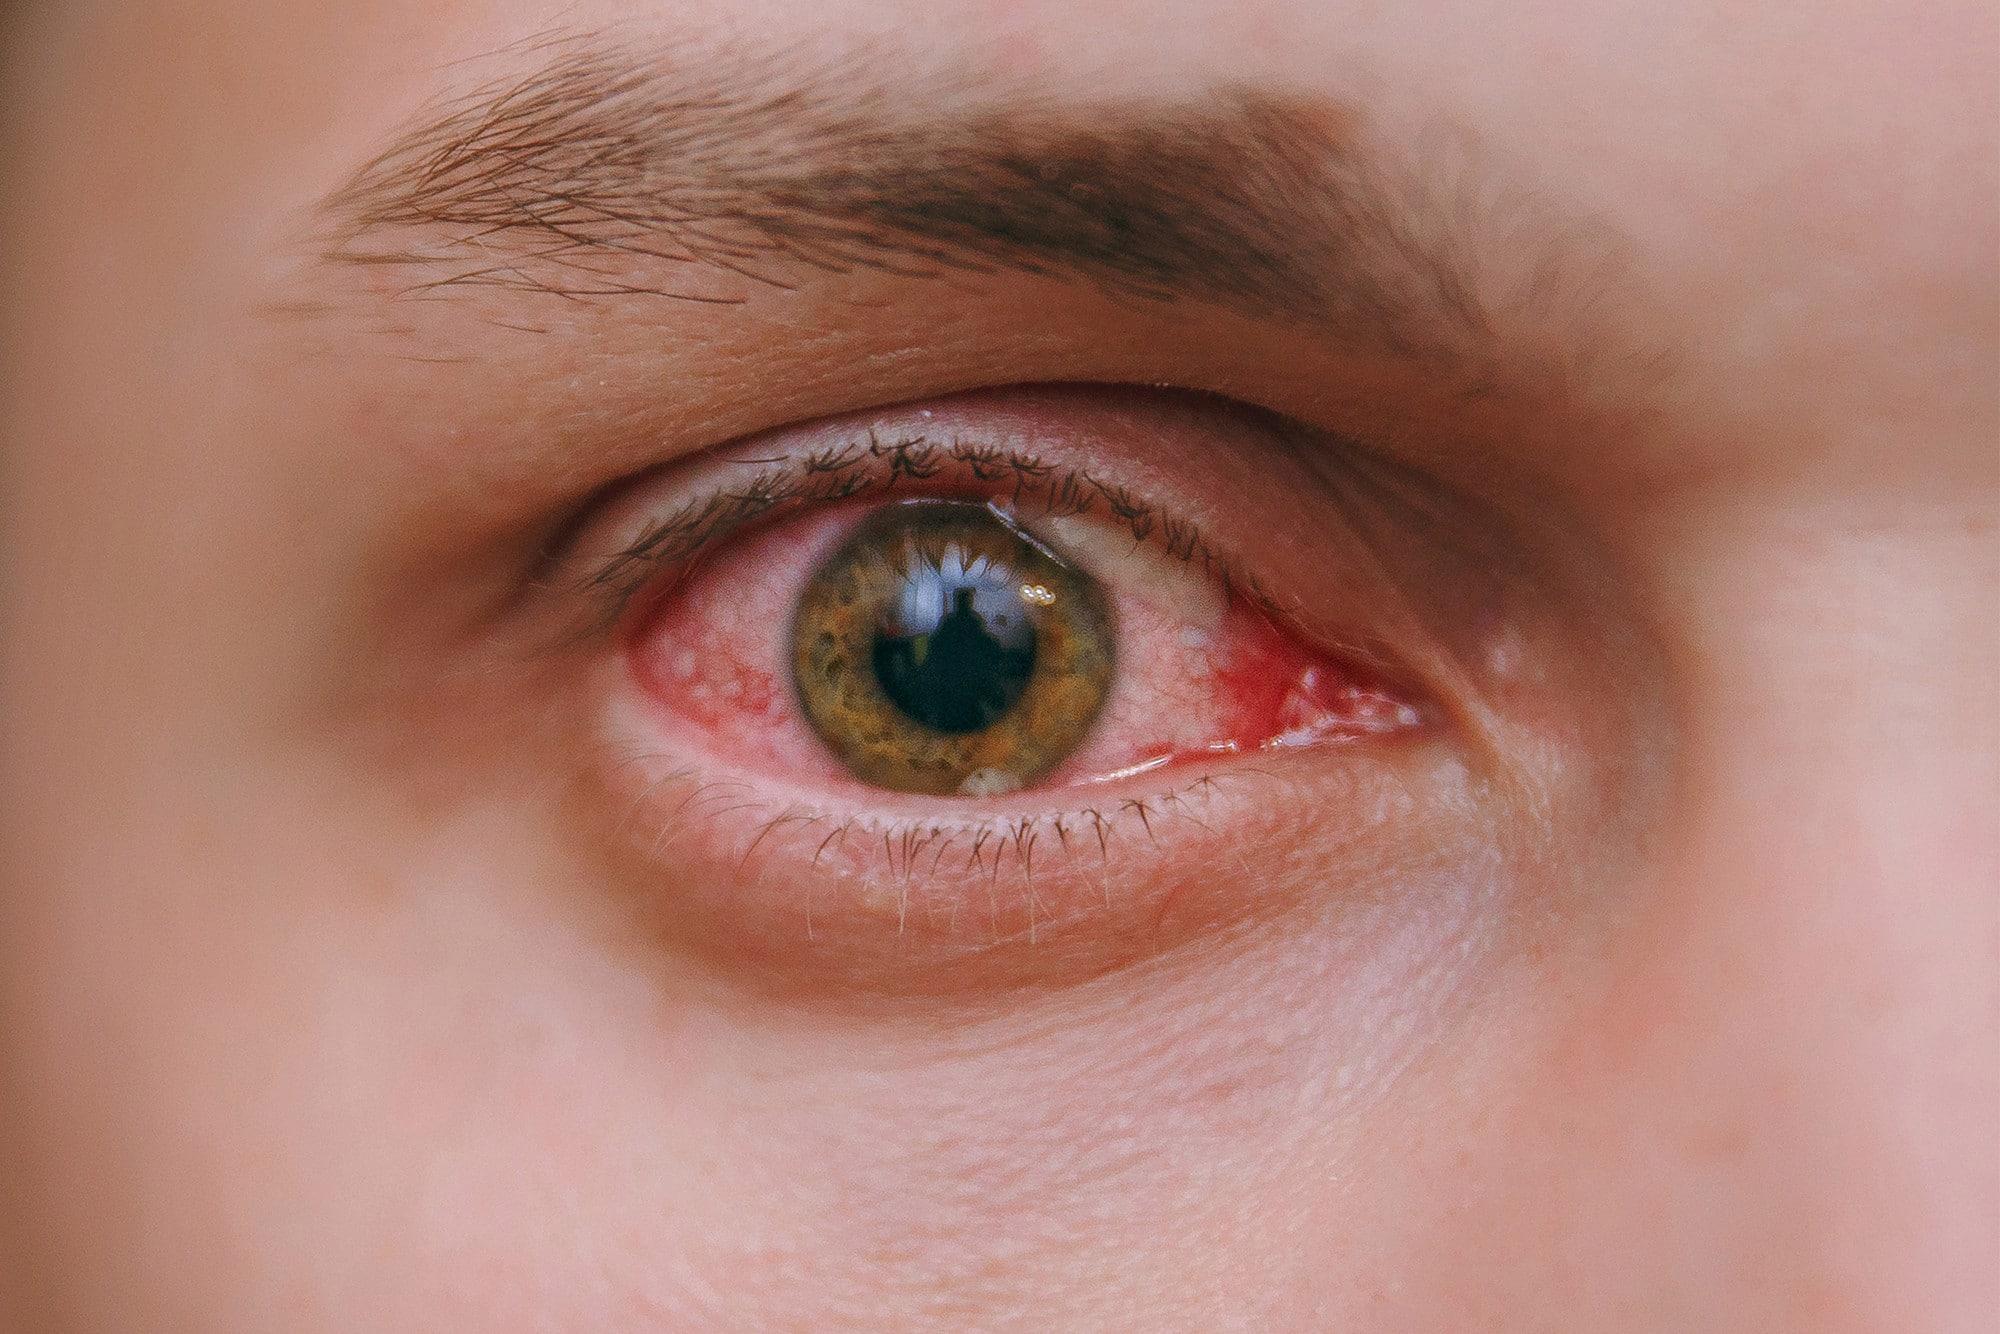 Препарат против импотенции лишил мужчину цветового зрения